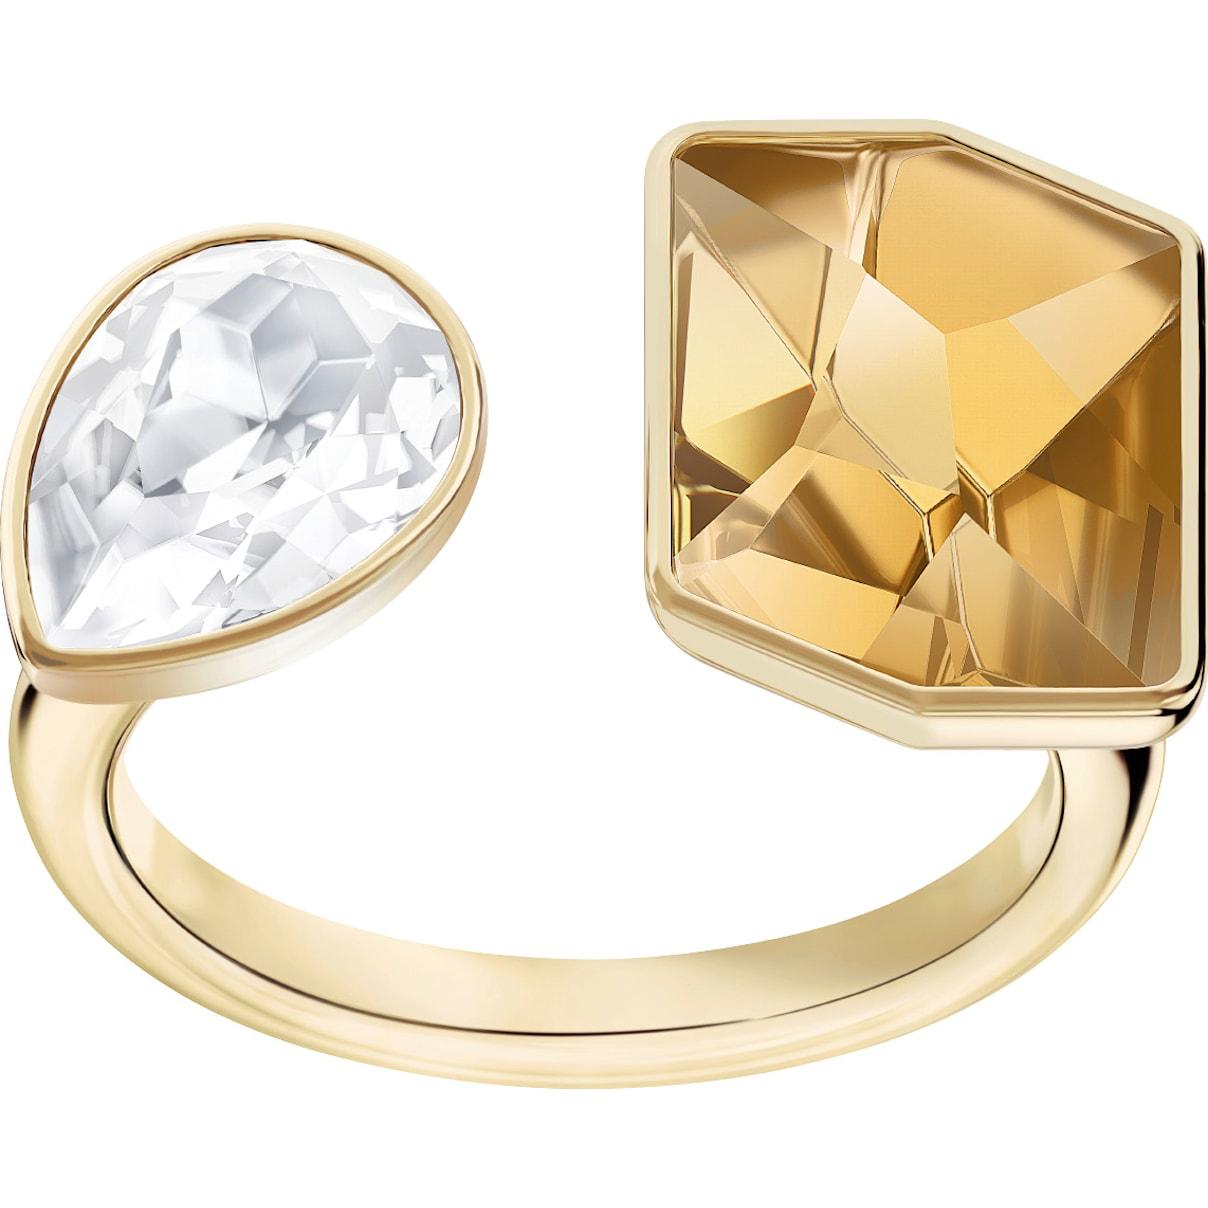 Swarovski Prisma Motif Ring, Golden, Gold-tone plated